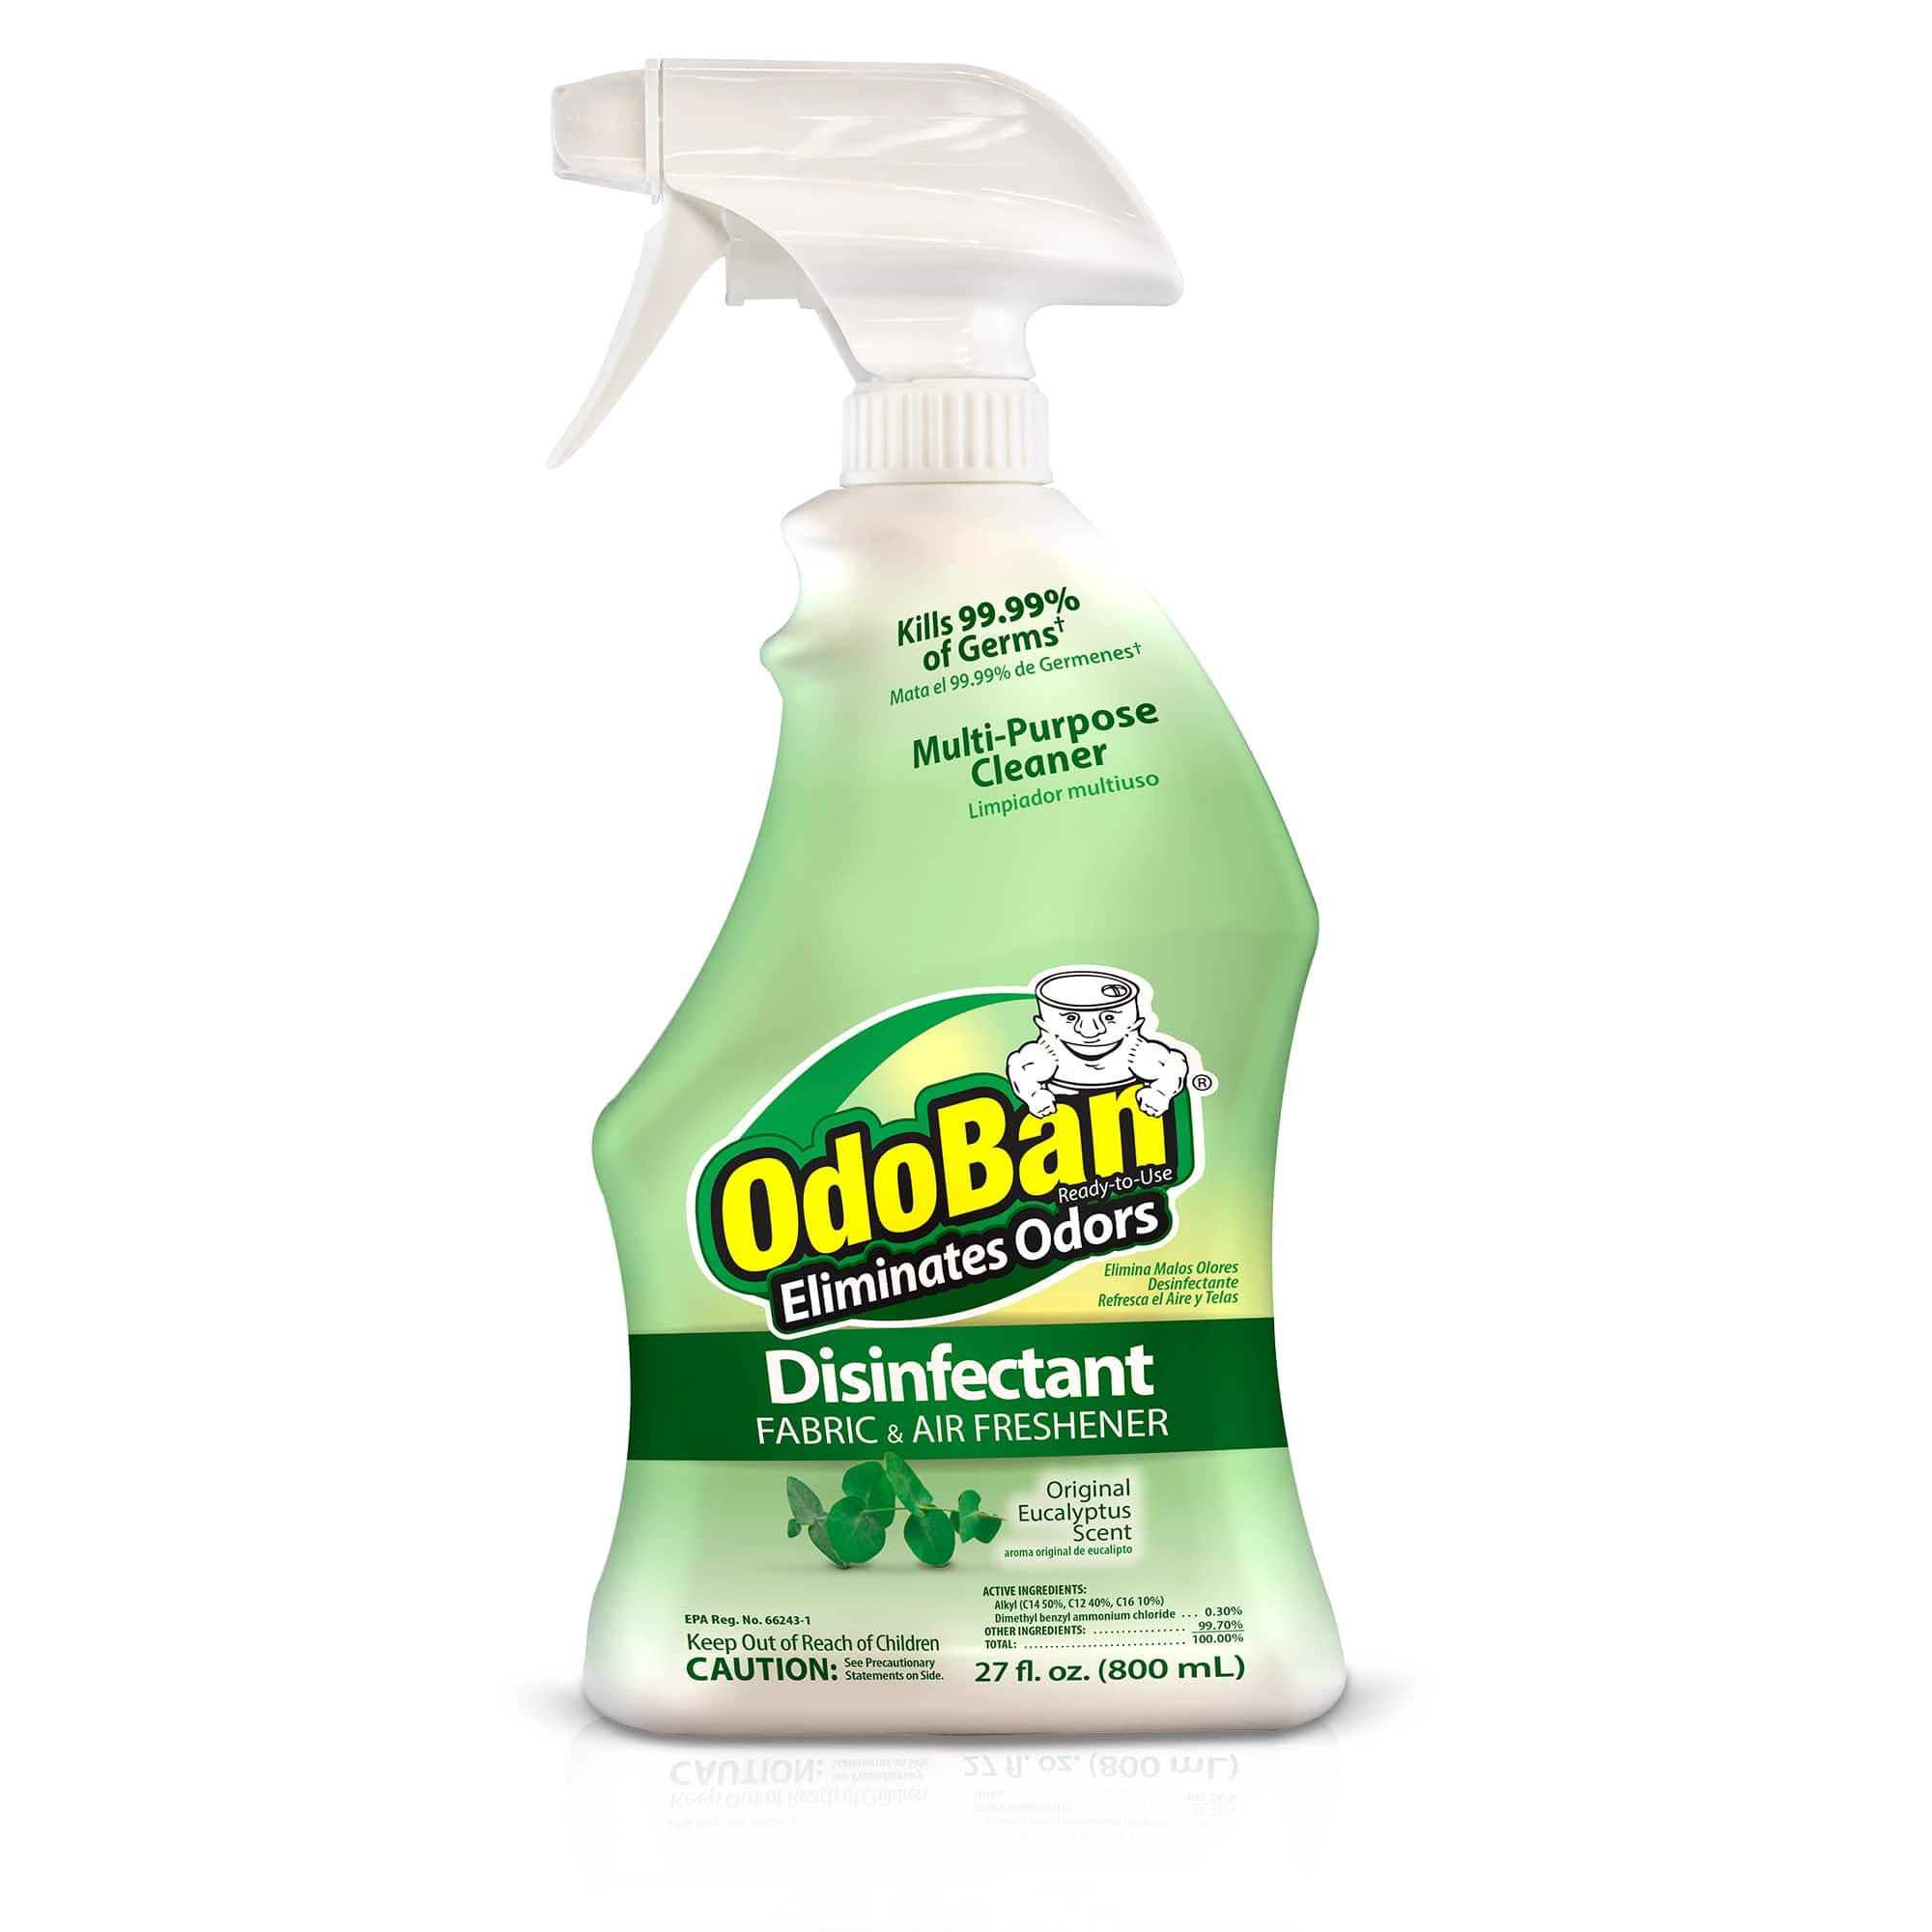 OdoBan Original Eucalyptus Scent Disinfectant Fabric & Air Freshener, 27 fl oz $2.72(YMMV)